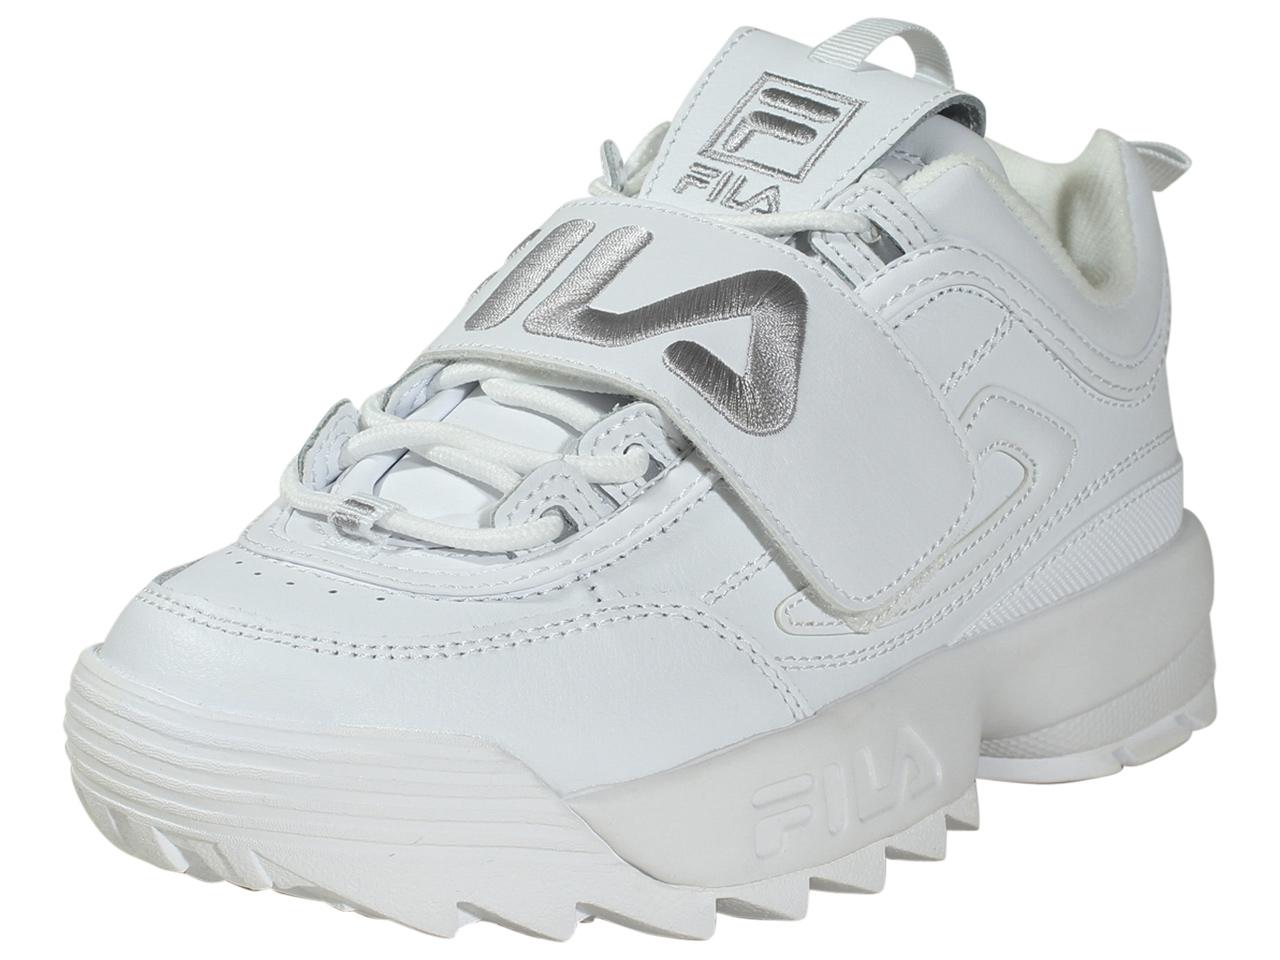 Fila Disruptor-II-Applique Sneakers